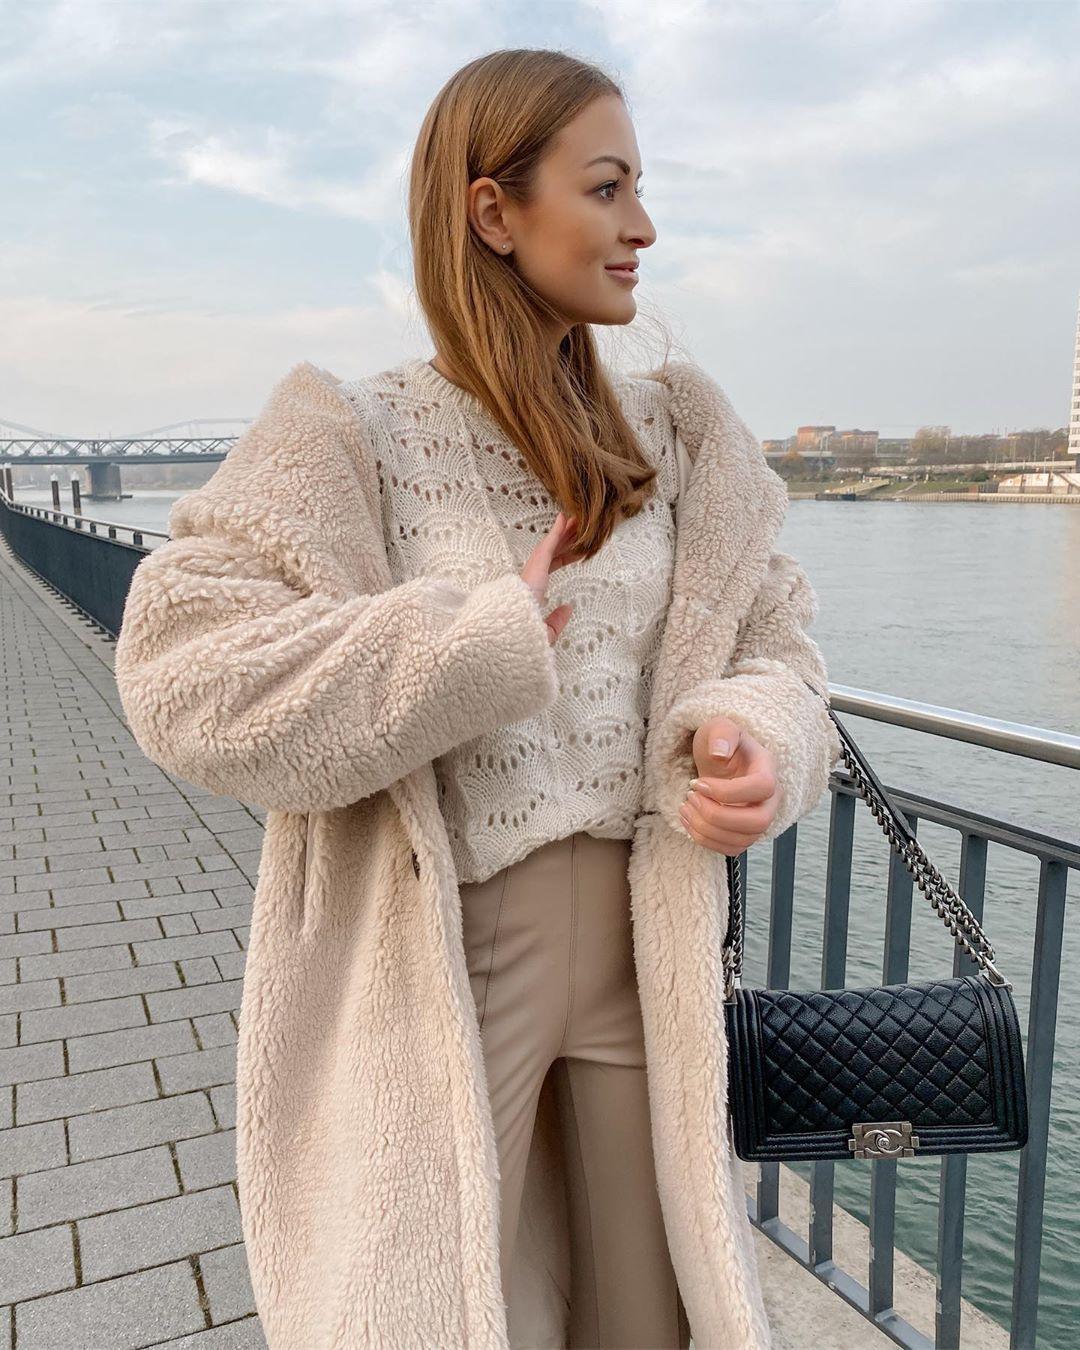 synthetic leather leggings de Zara sur rosaandthecity